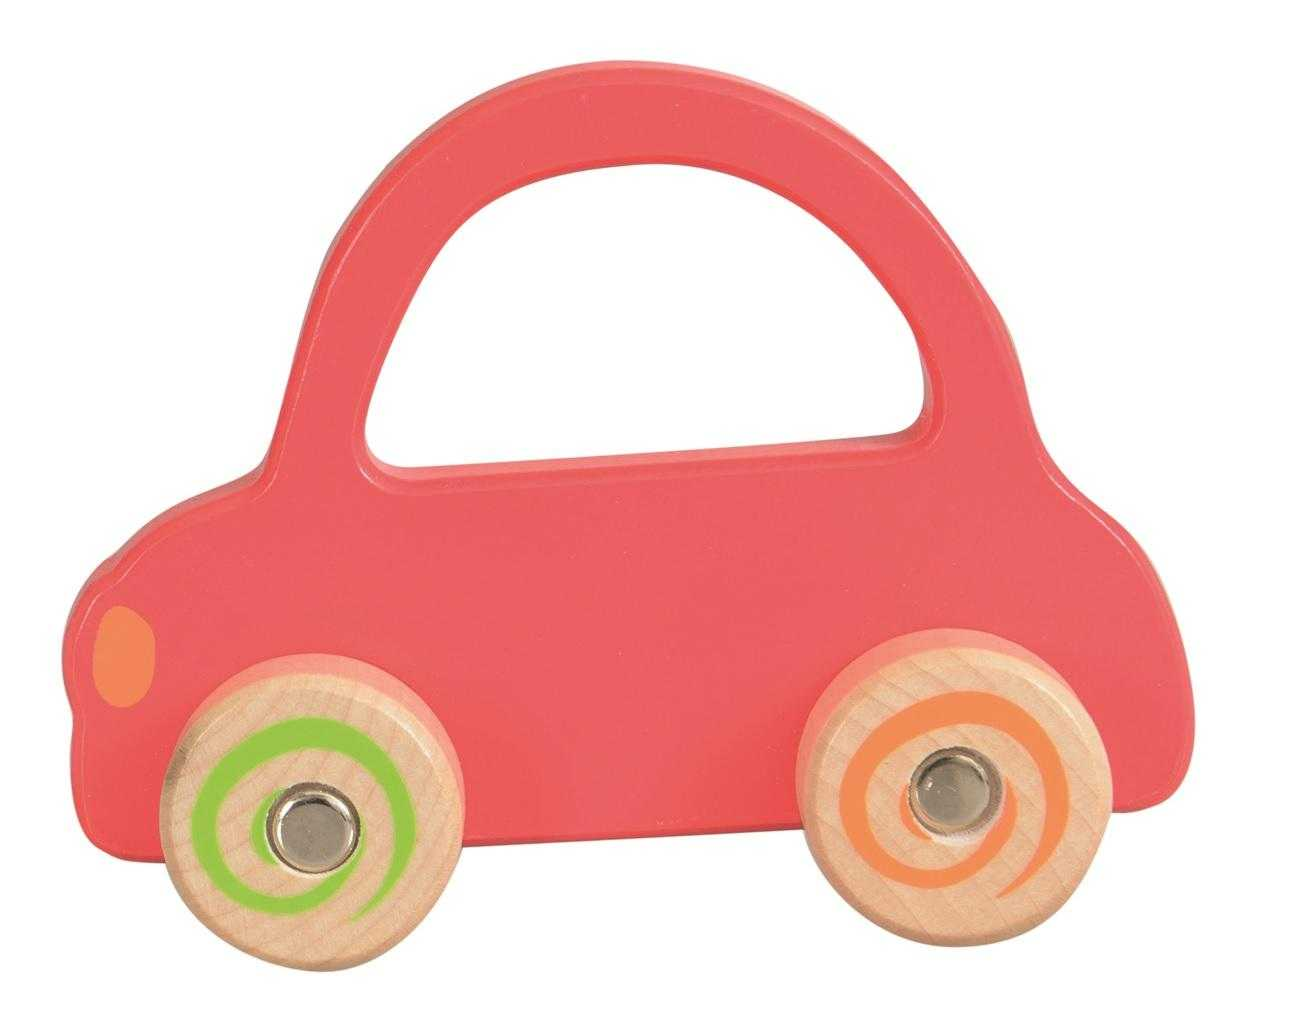 Masinuta lemn rosie egmont toys imagine